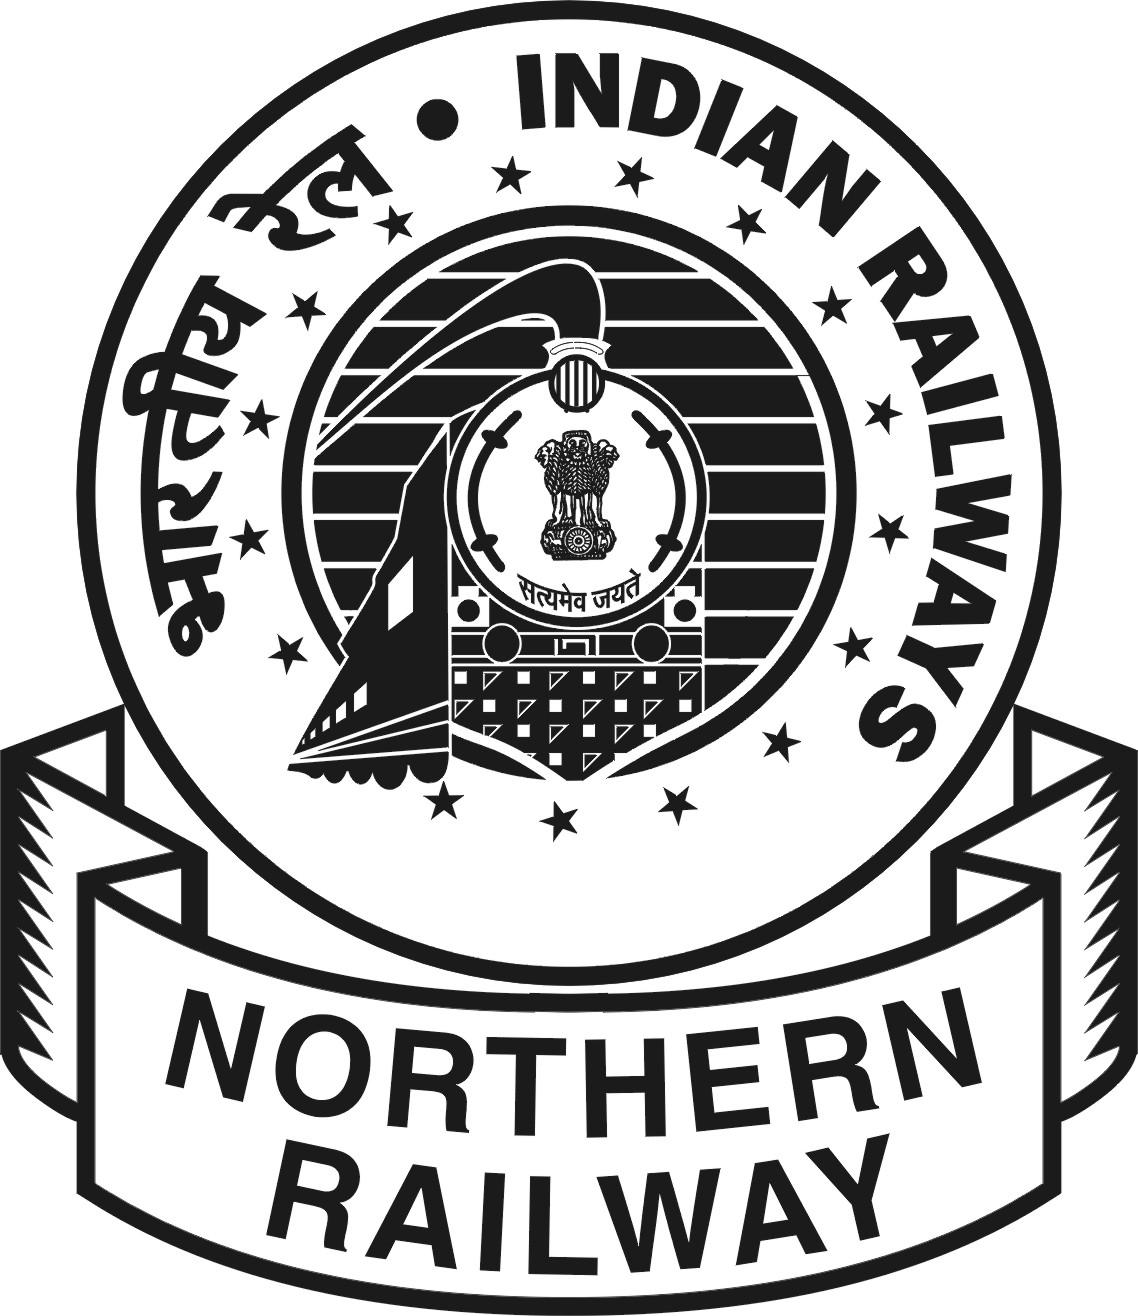 Railways clipart indian railway #13